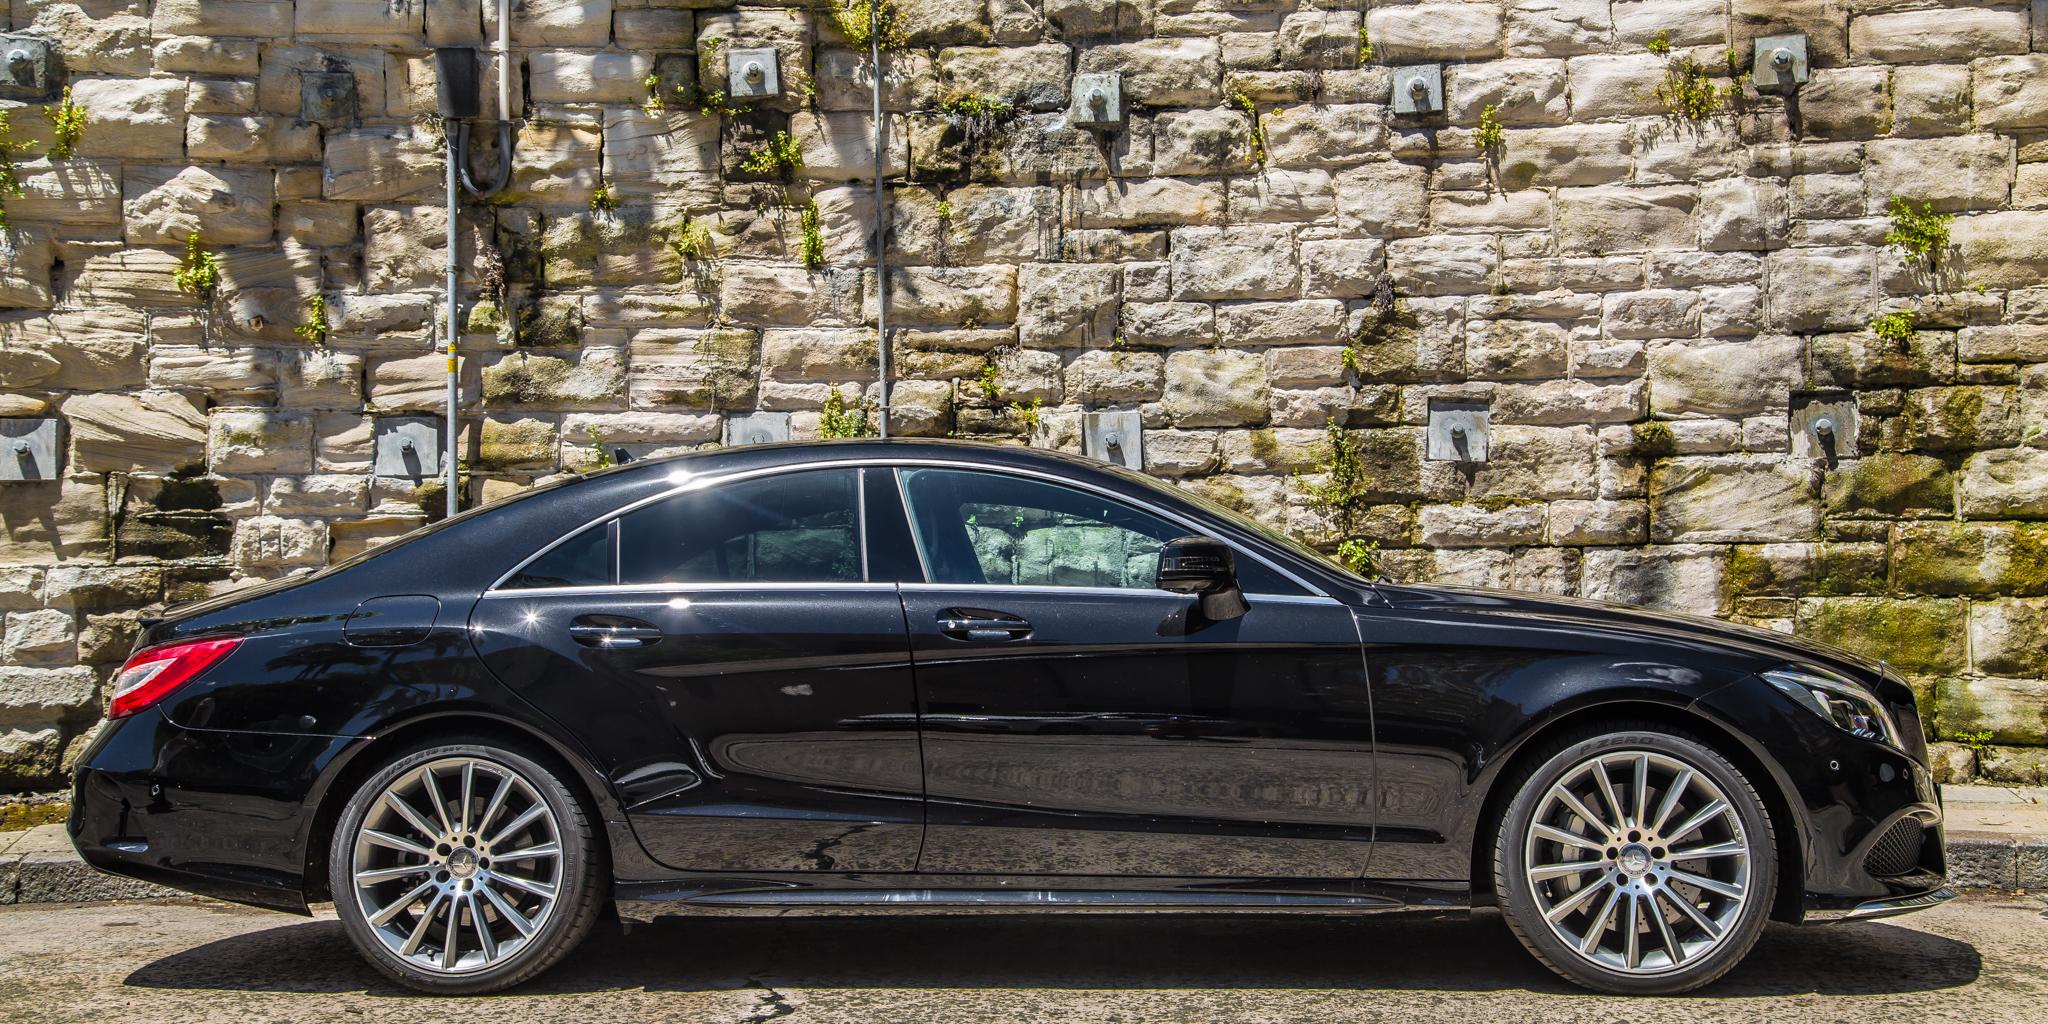 2015 Mercedes Benz Cls500 Review Photos Caradvice